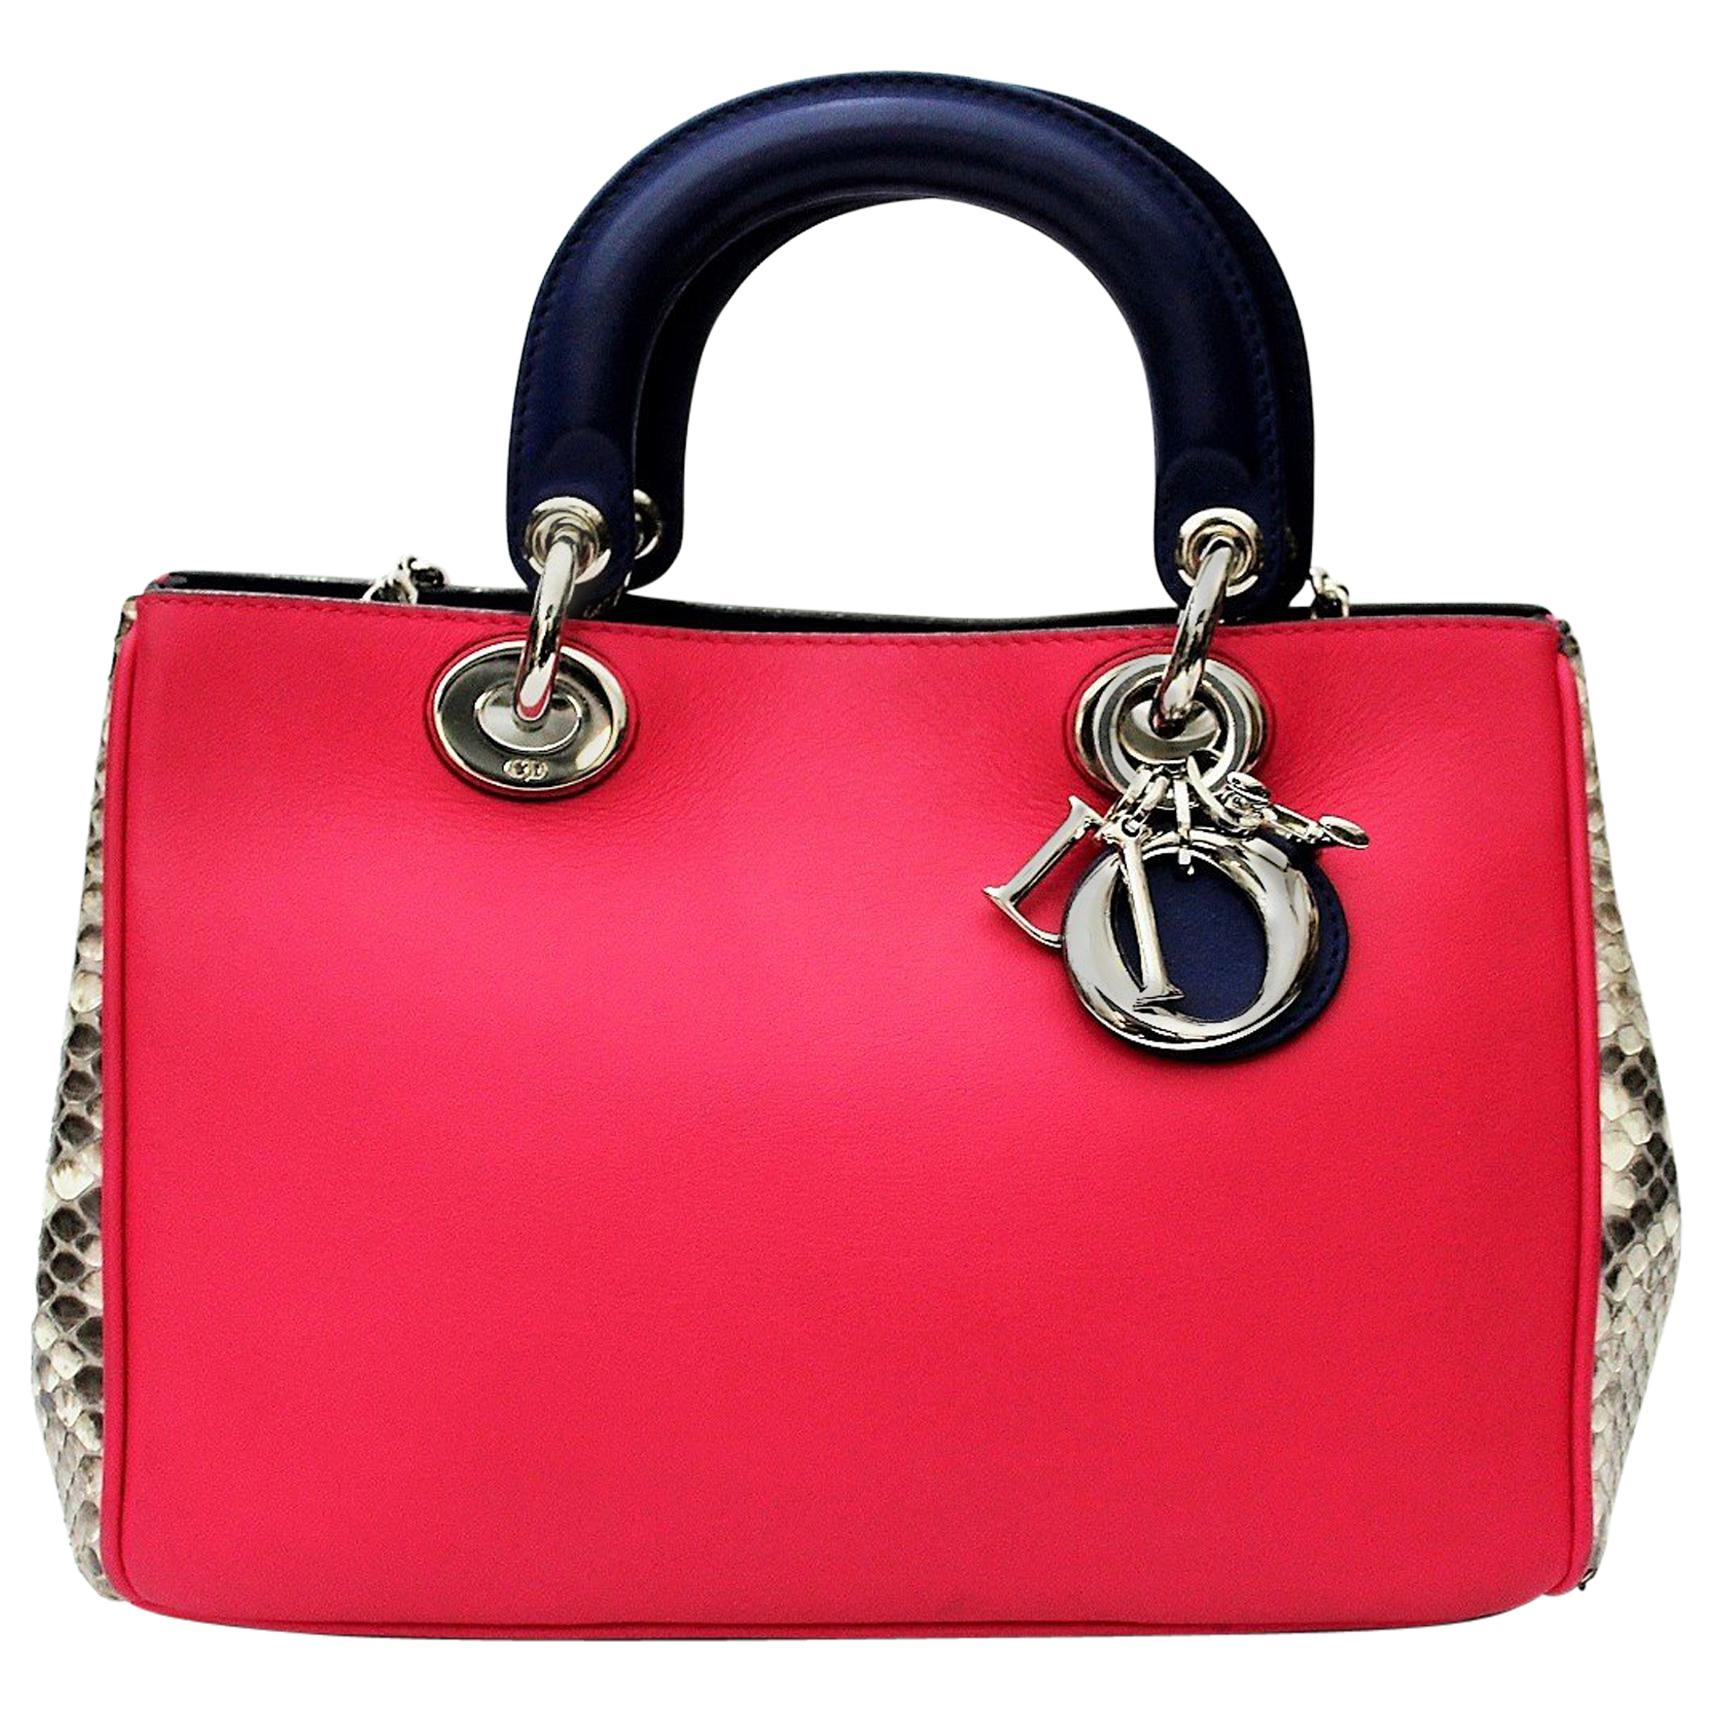 Christian Dior Limited Edition Python Leather Handbag